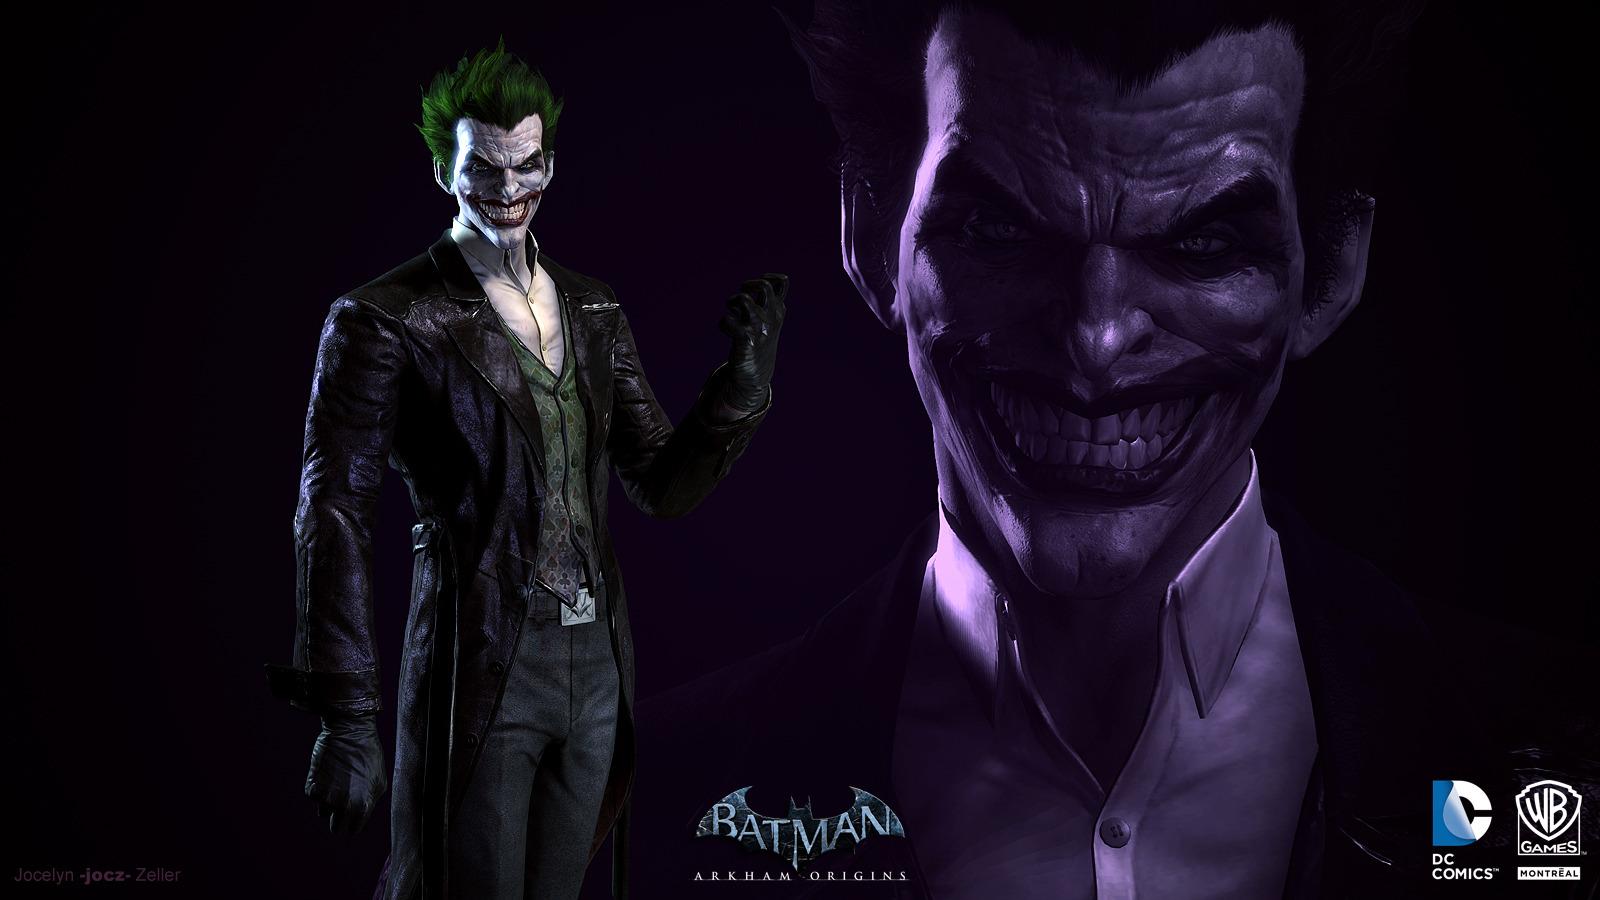 batman arkham origins joker wallpaper 99097 1600x900